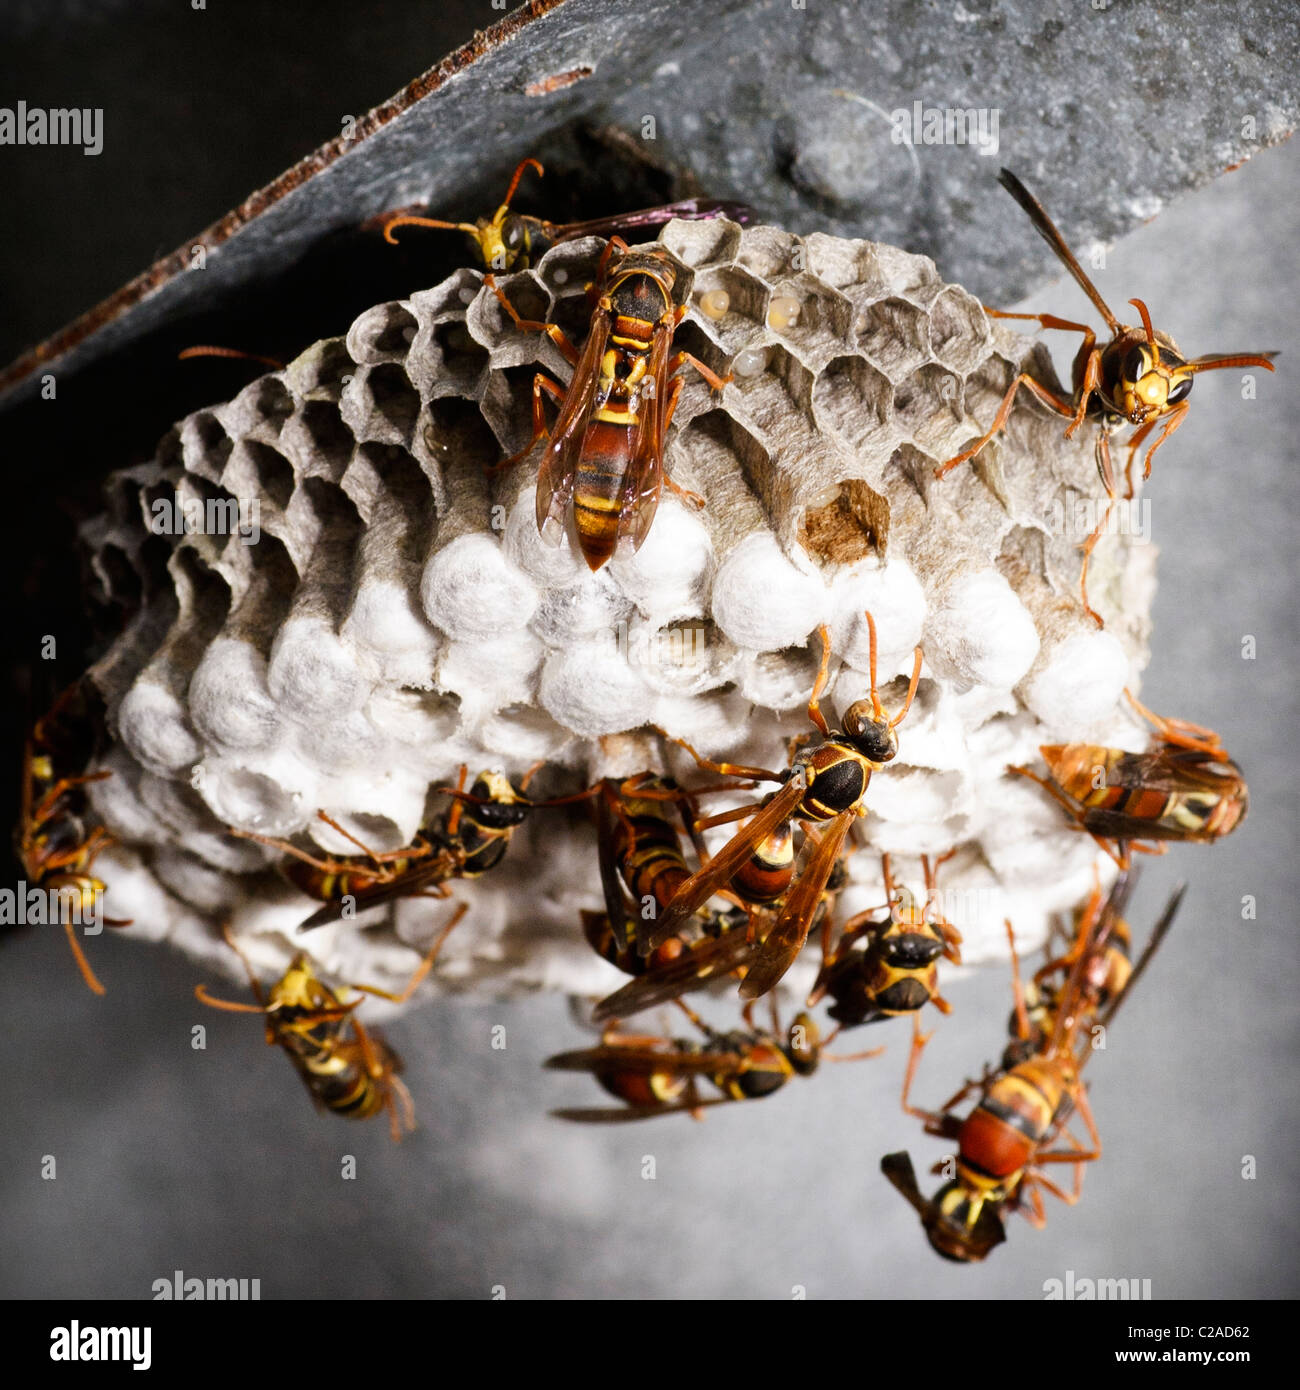 Paper Wasp Australia Stock Photos & Paper Wasp Australia ...